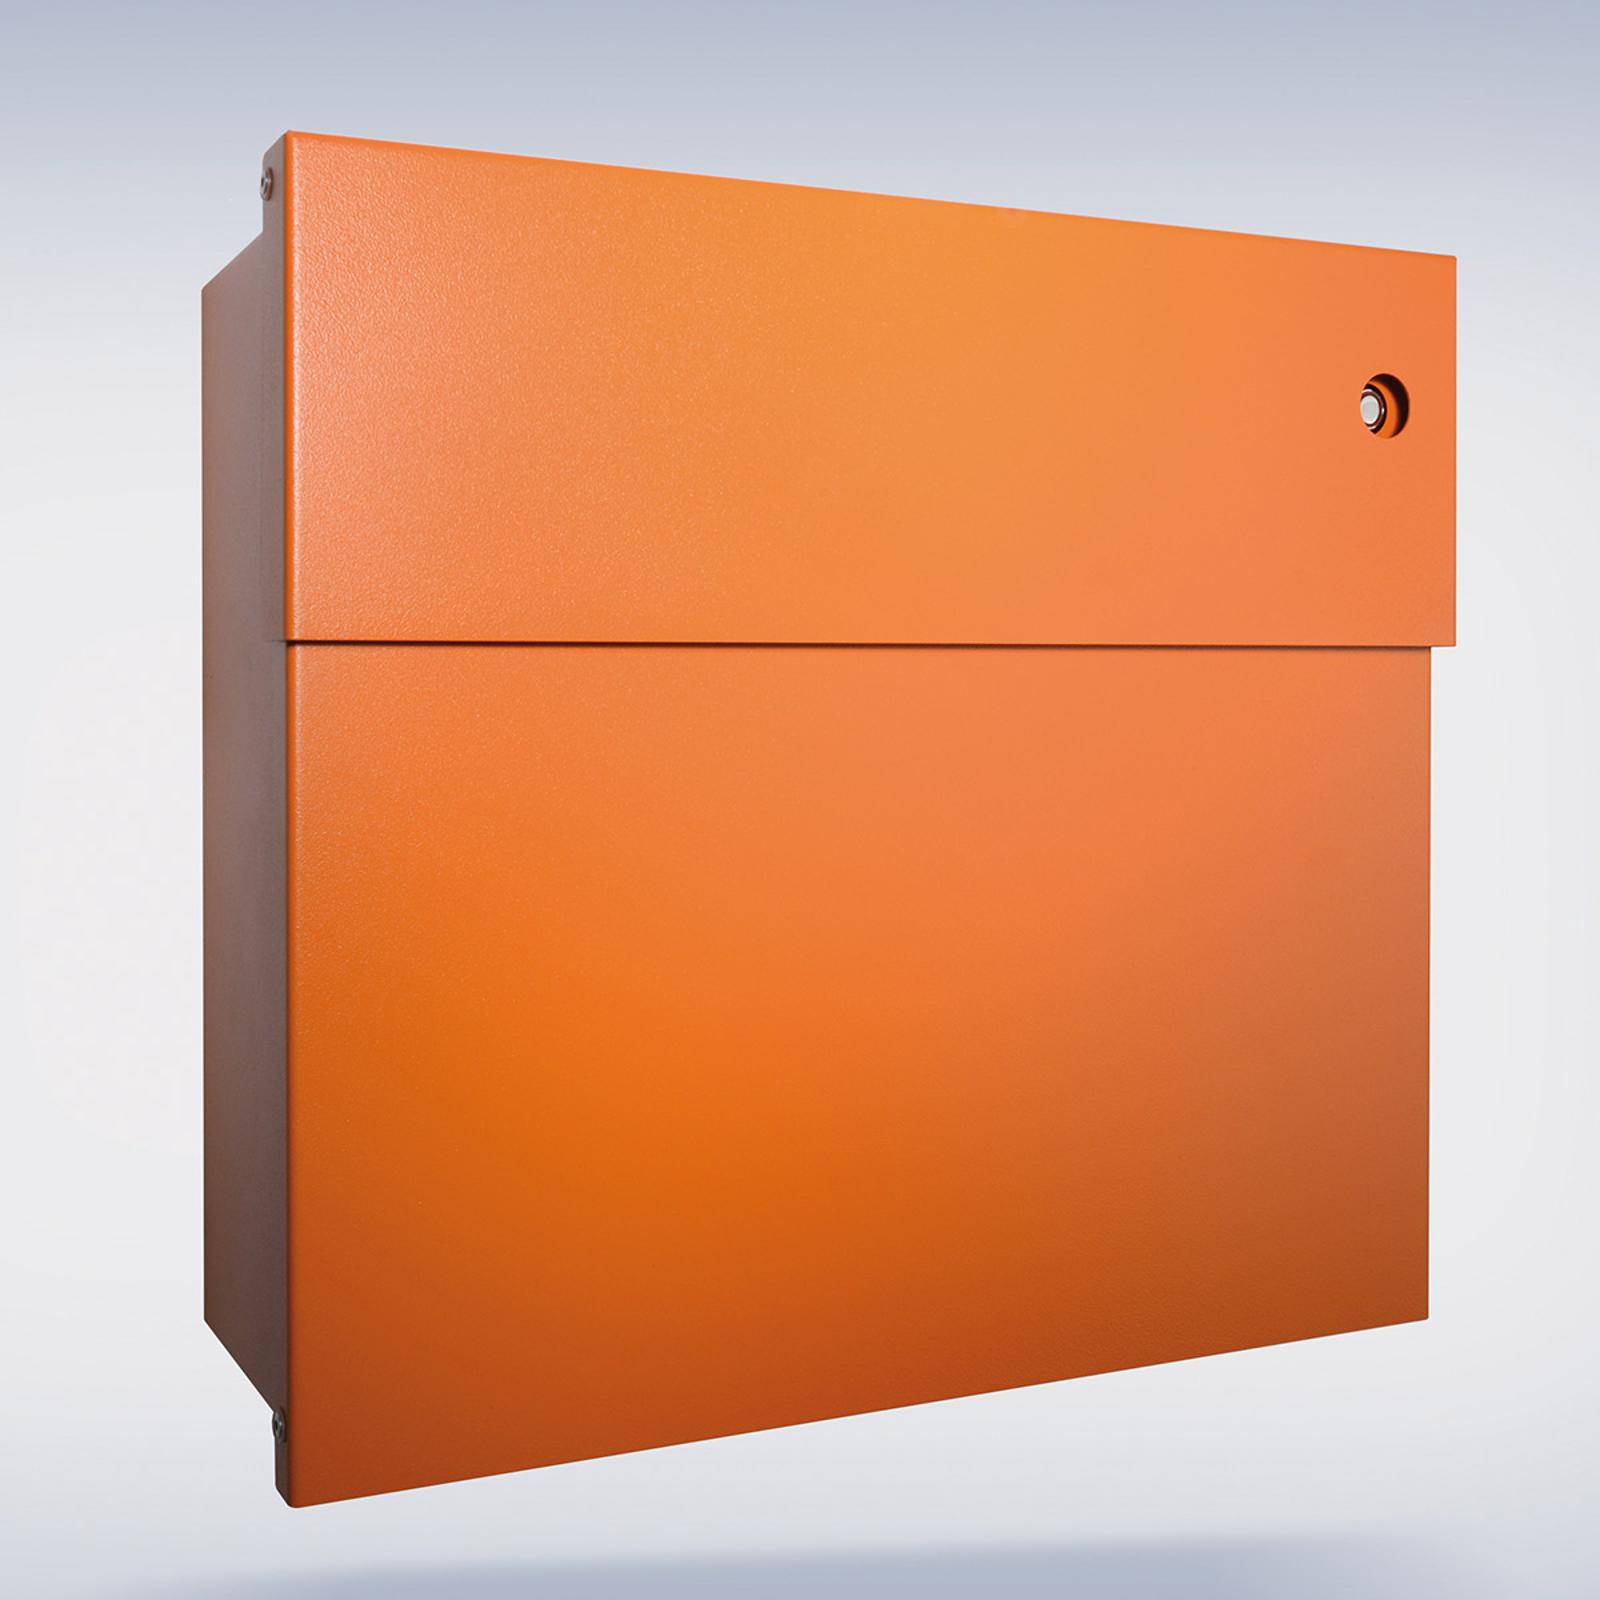 Brievenbus Letterman IV, rode Klingel, oranje